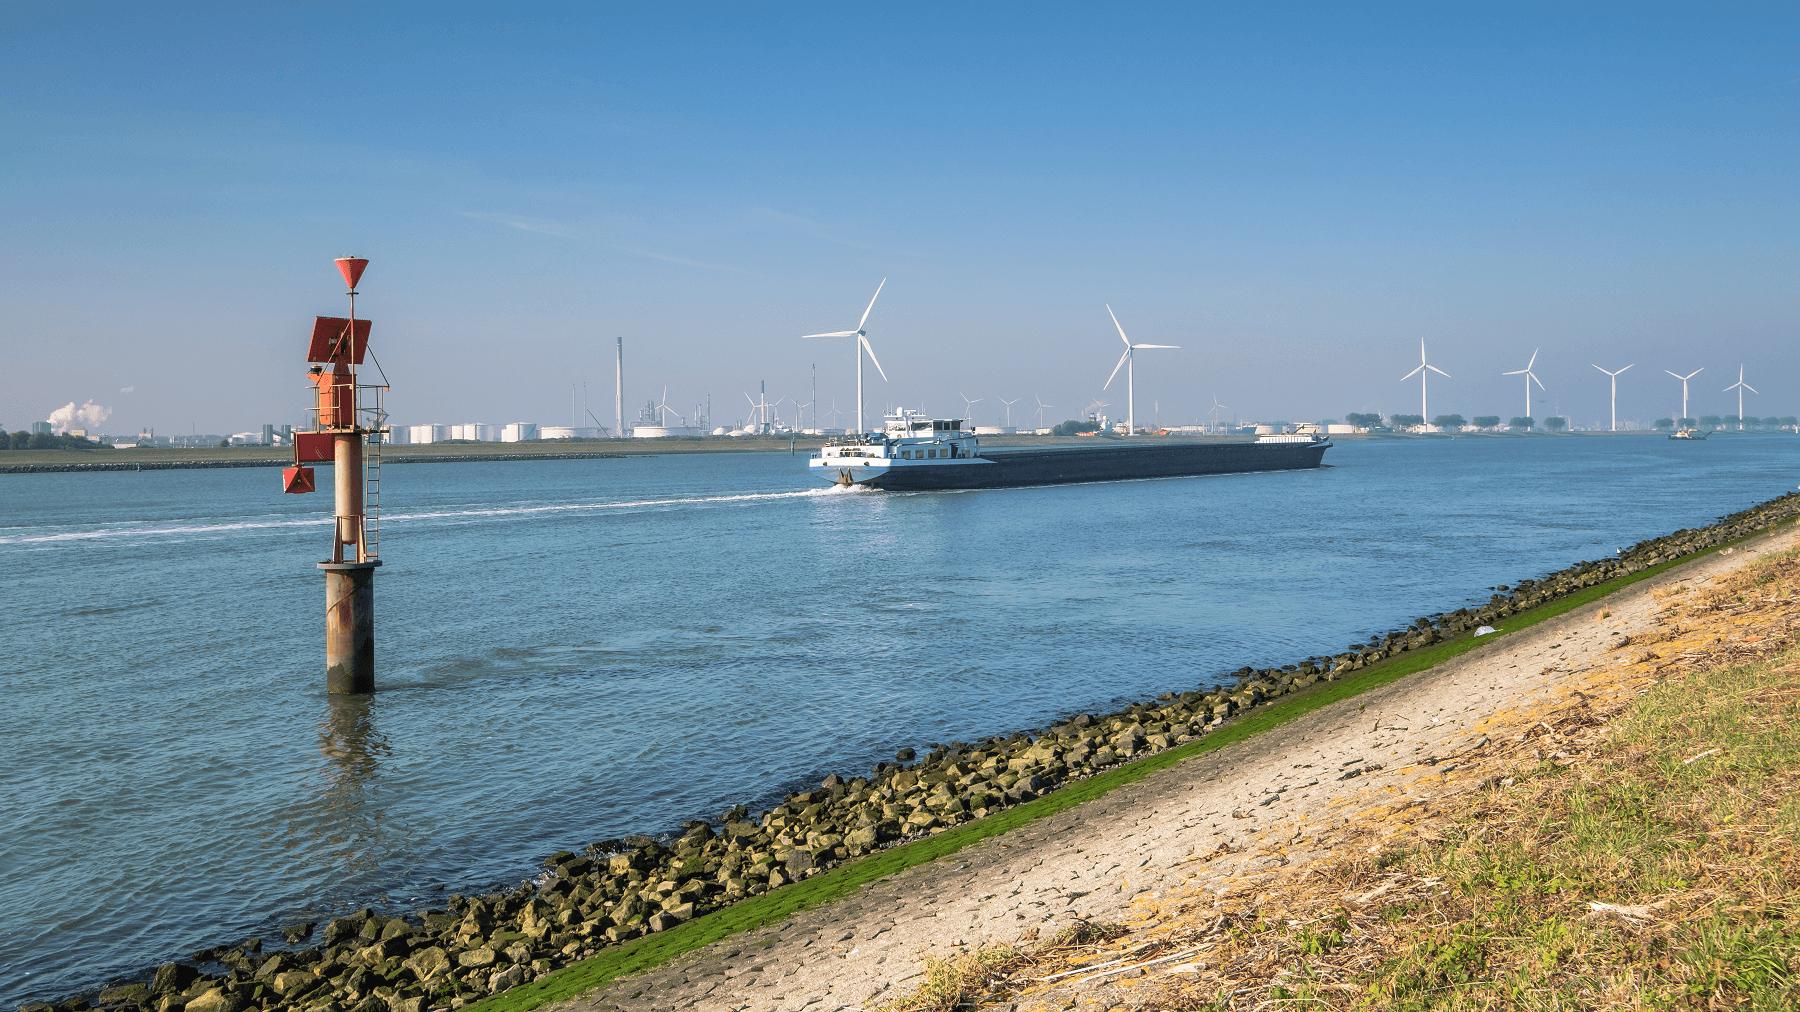 Verdieping Nieuwe Waterweg verziltingsmonitor HydroLogic